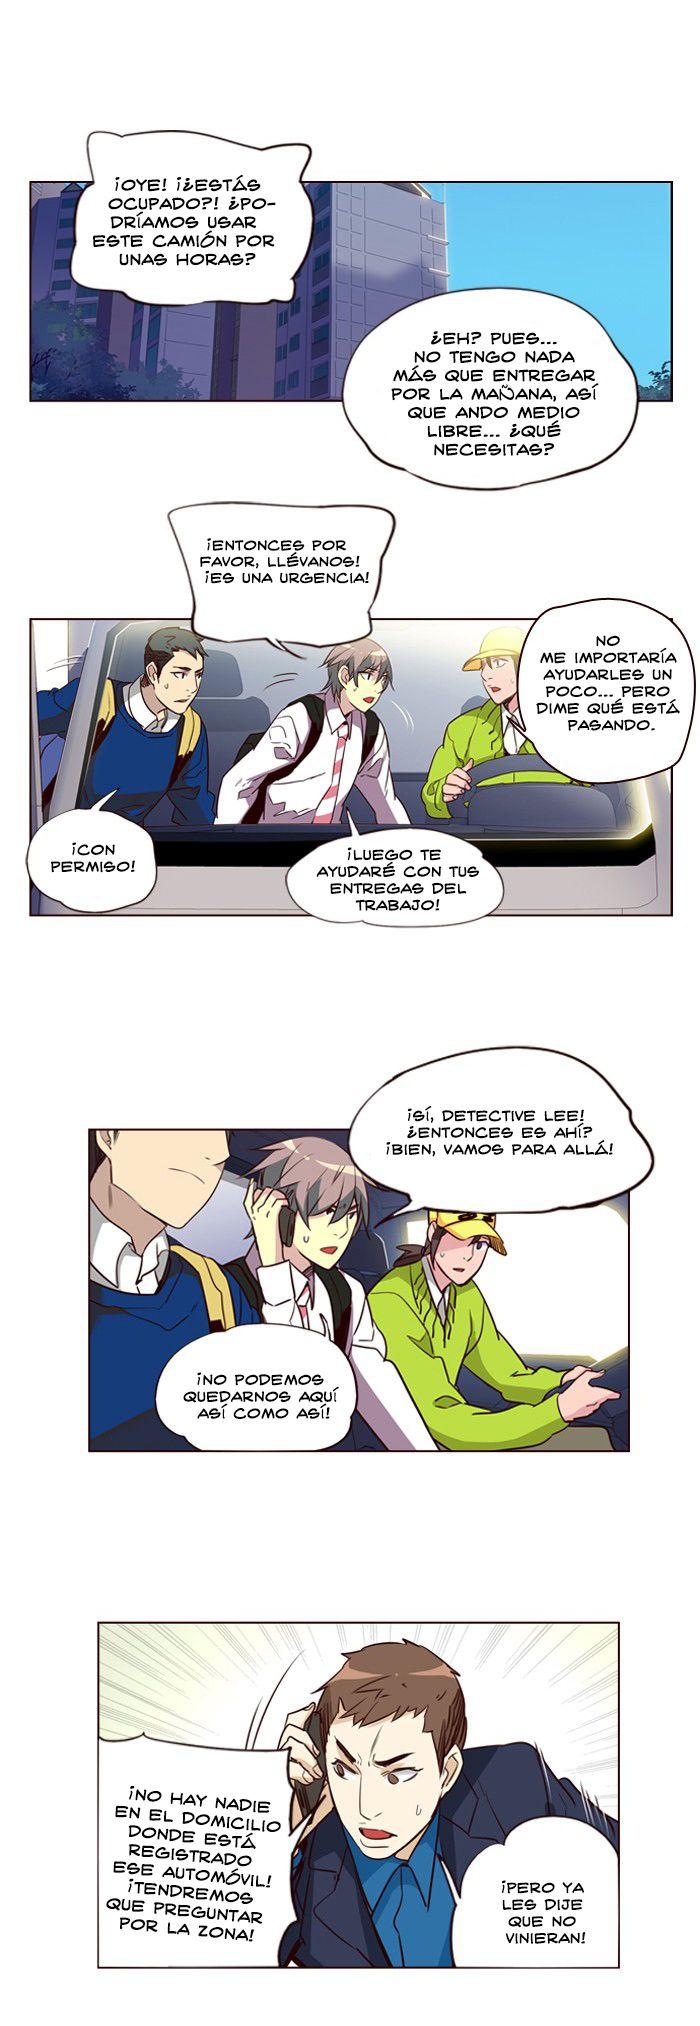 http://c5.ninemanga.com/es_manga/pic2/32/416/515615/68c1f25dcbd82e048c6d723b16b456df.jpg Page 5